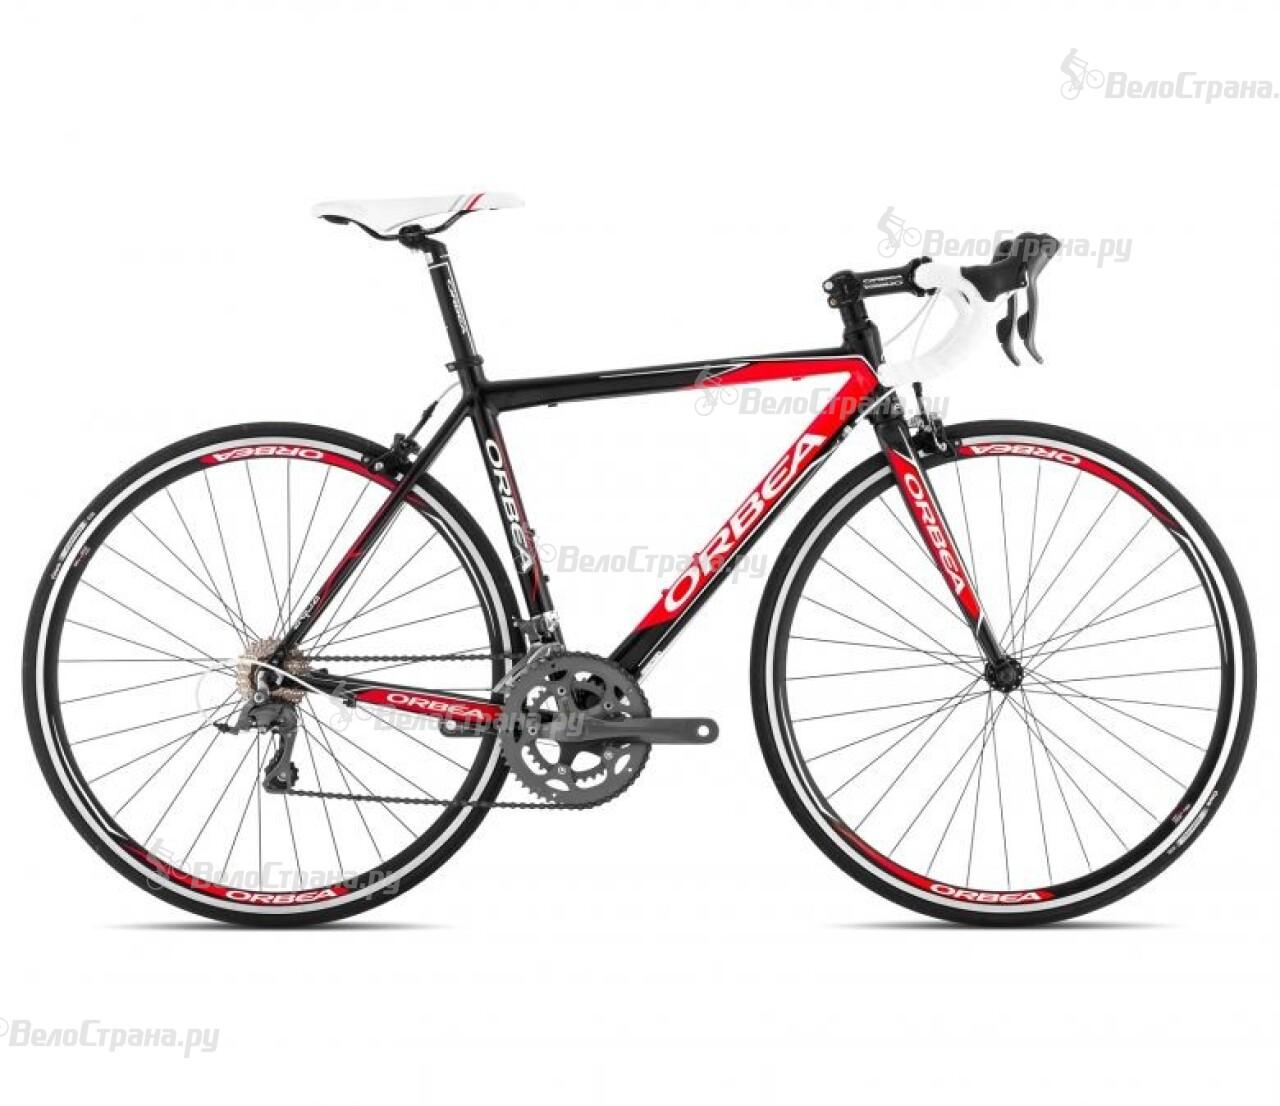 Велосипед Orbea Aqua 50 (2014) велосипед orbea aqua t23 2013